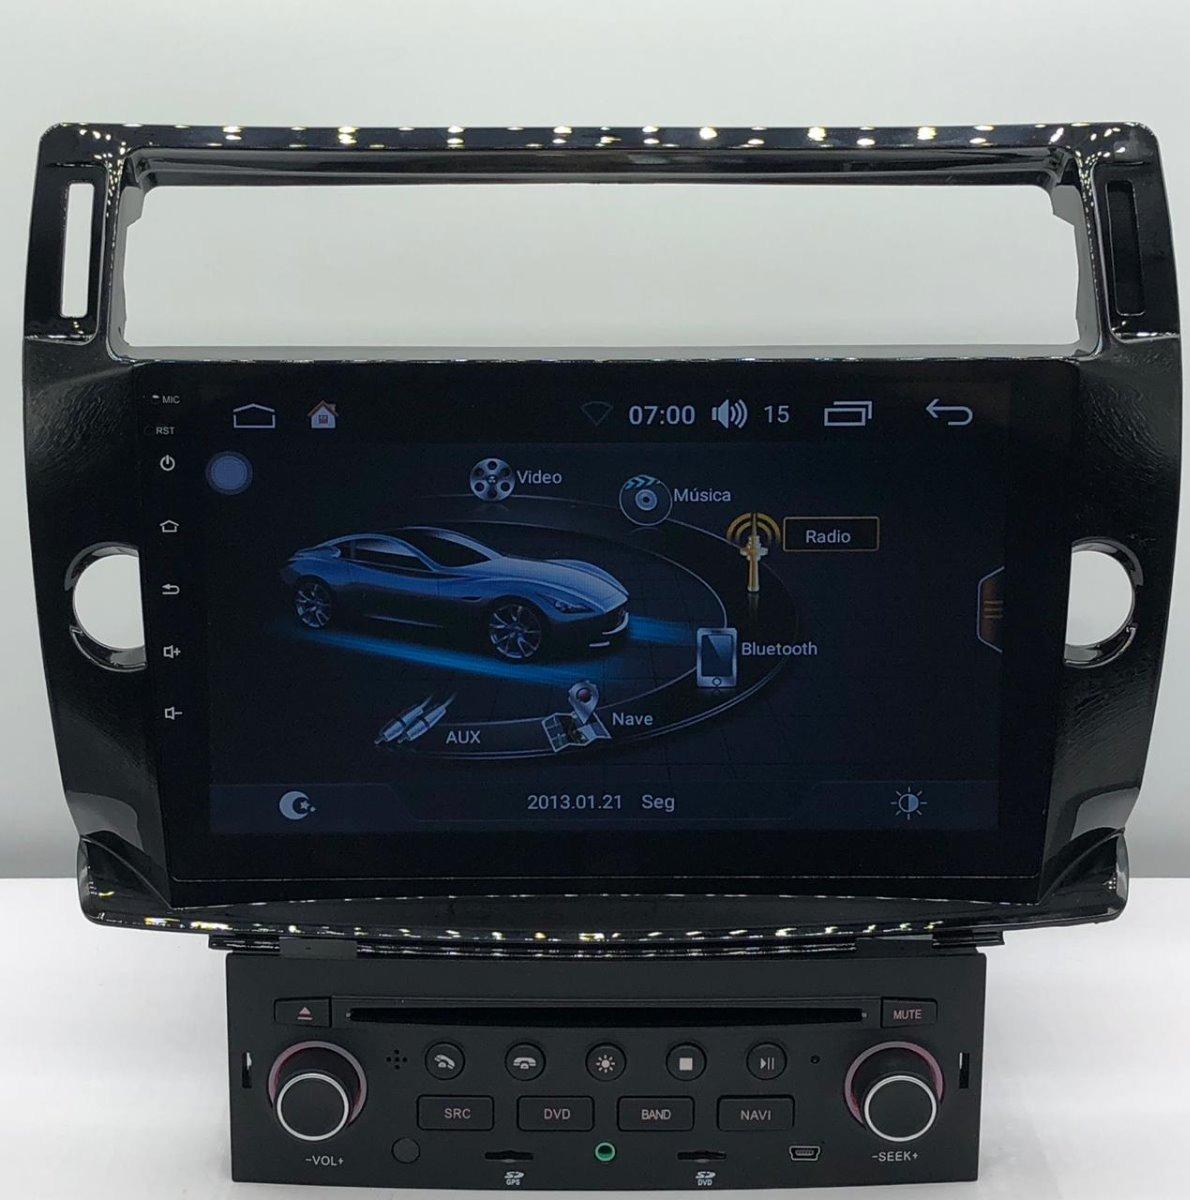 Kit Multimídia C4 Pallas Vtr Hatch Android 6 0 S170 10p Wifi